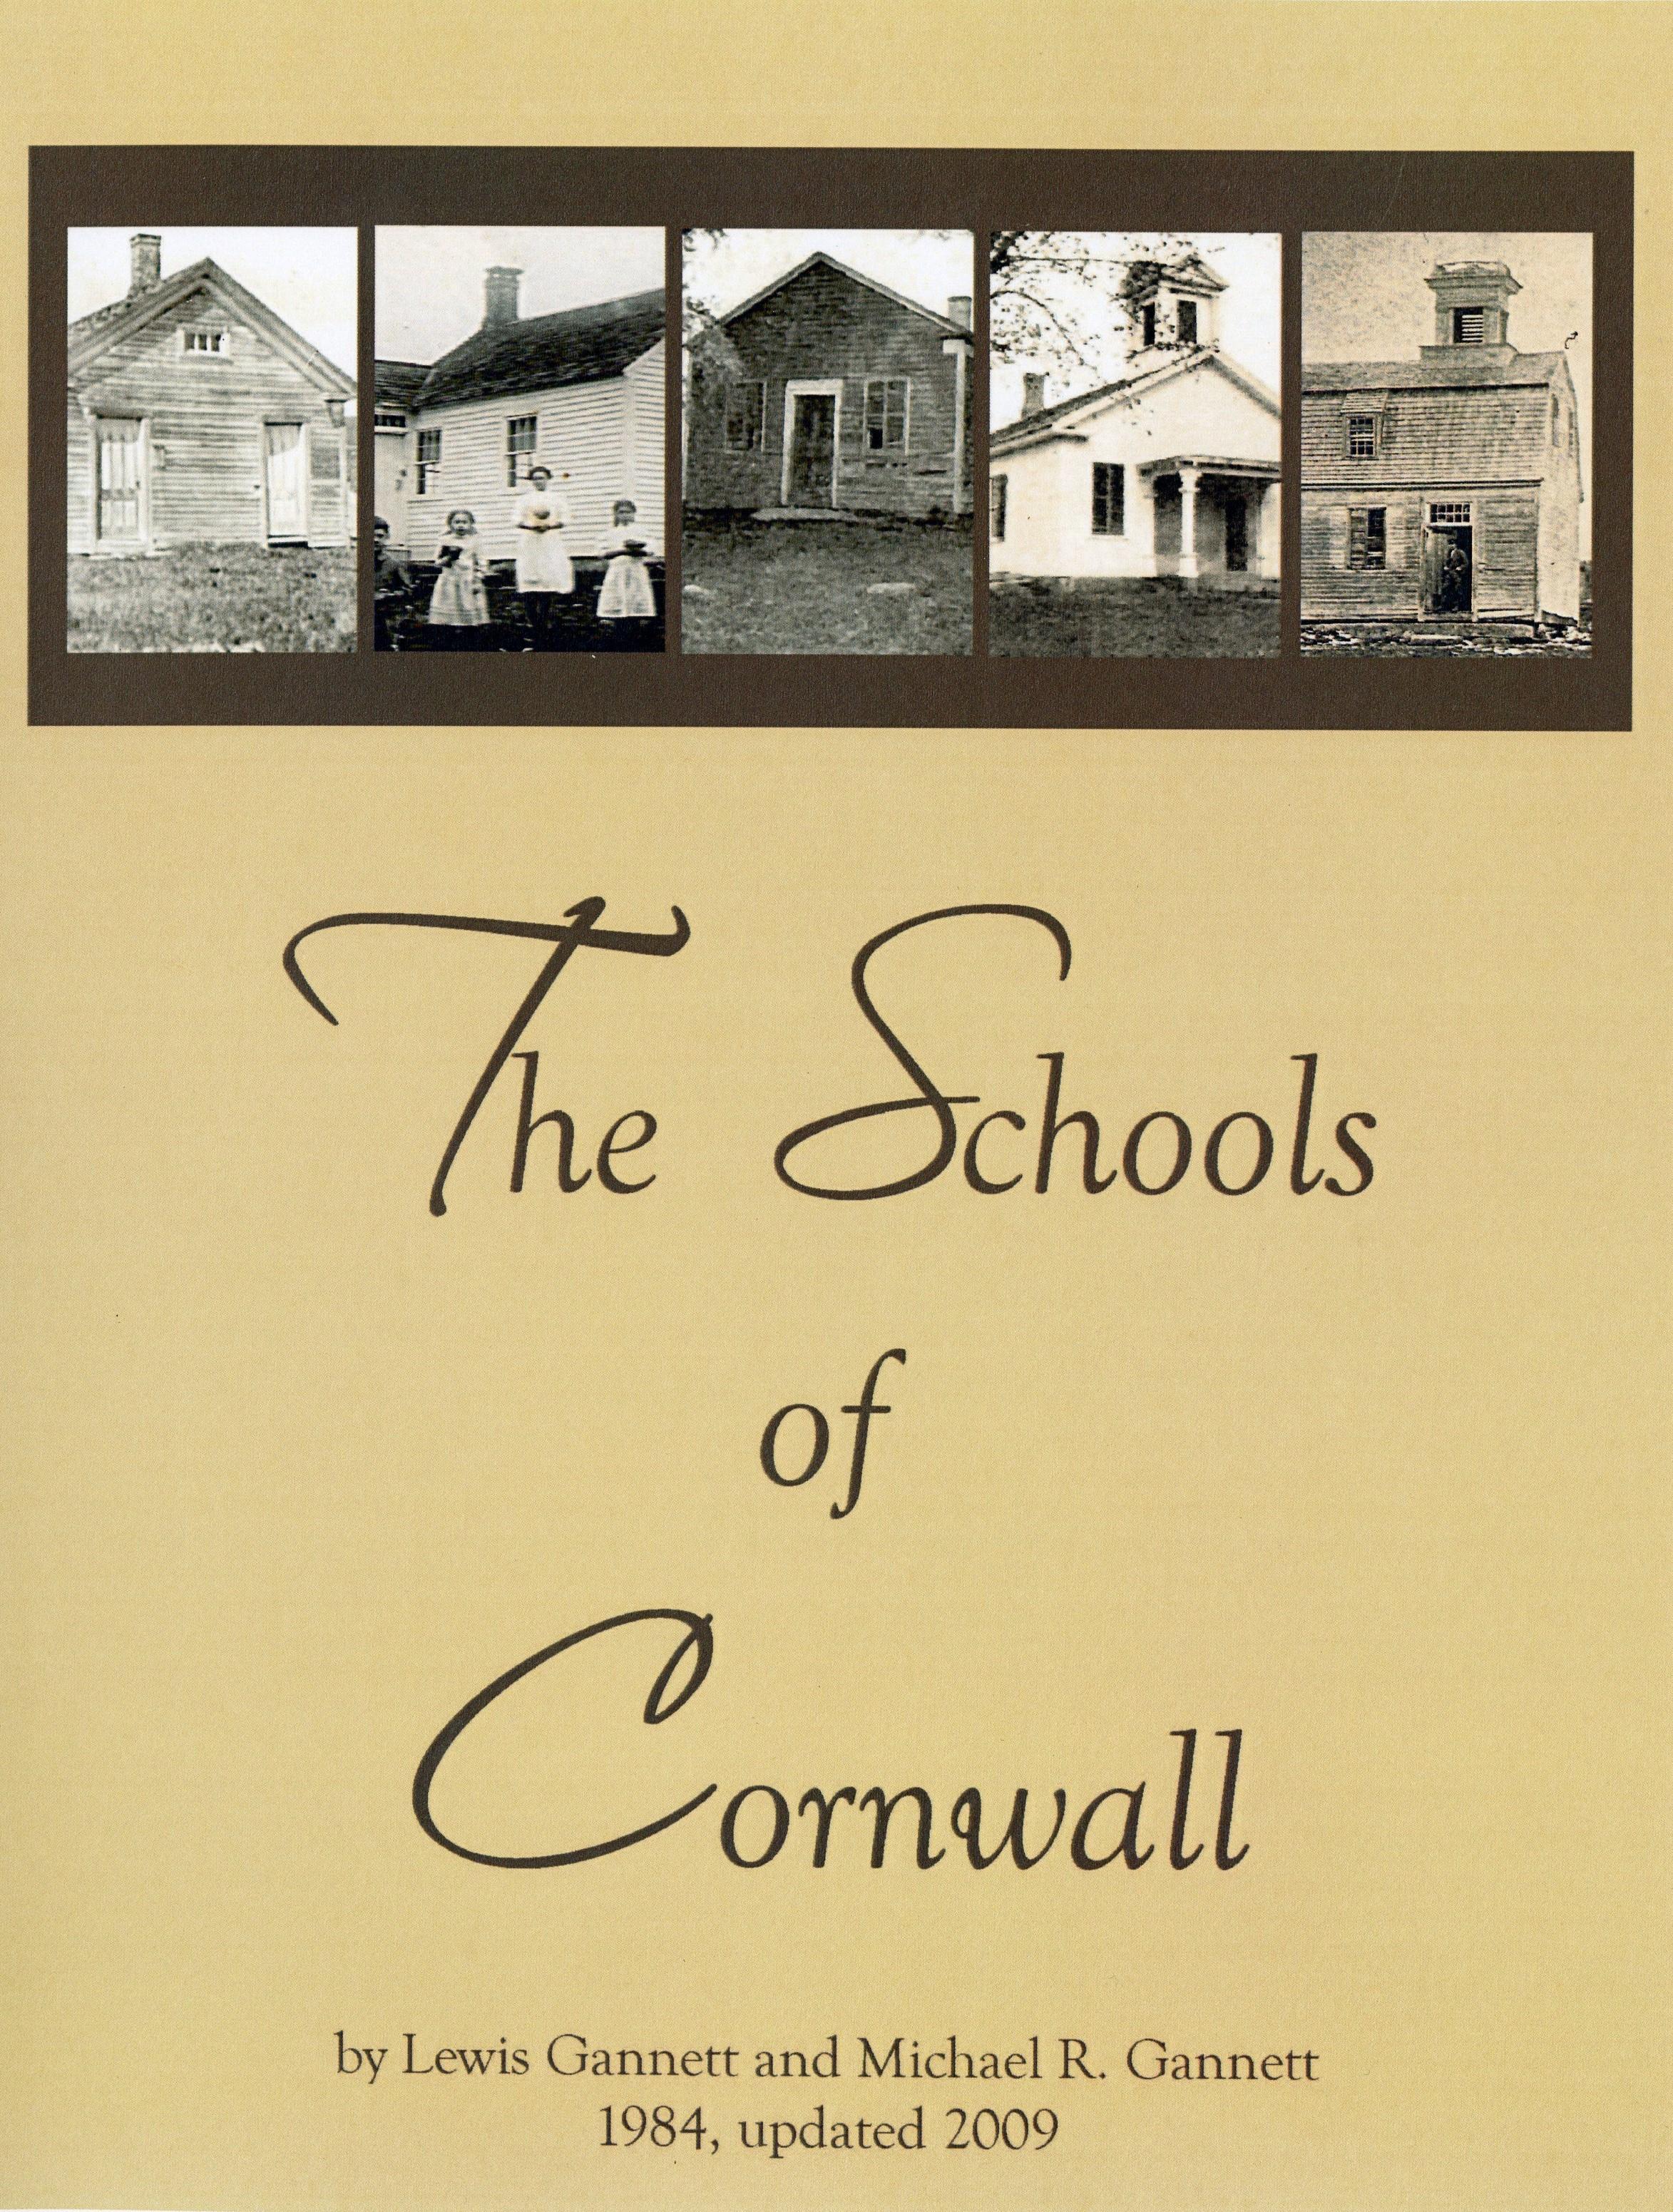 The Schools of Cornwall